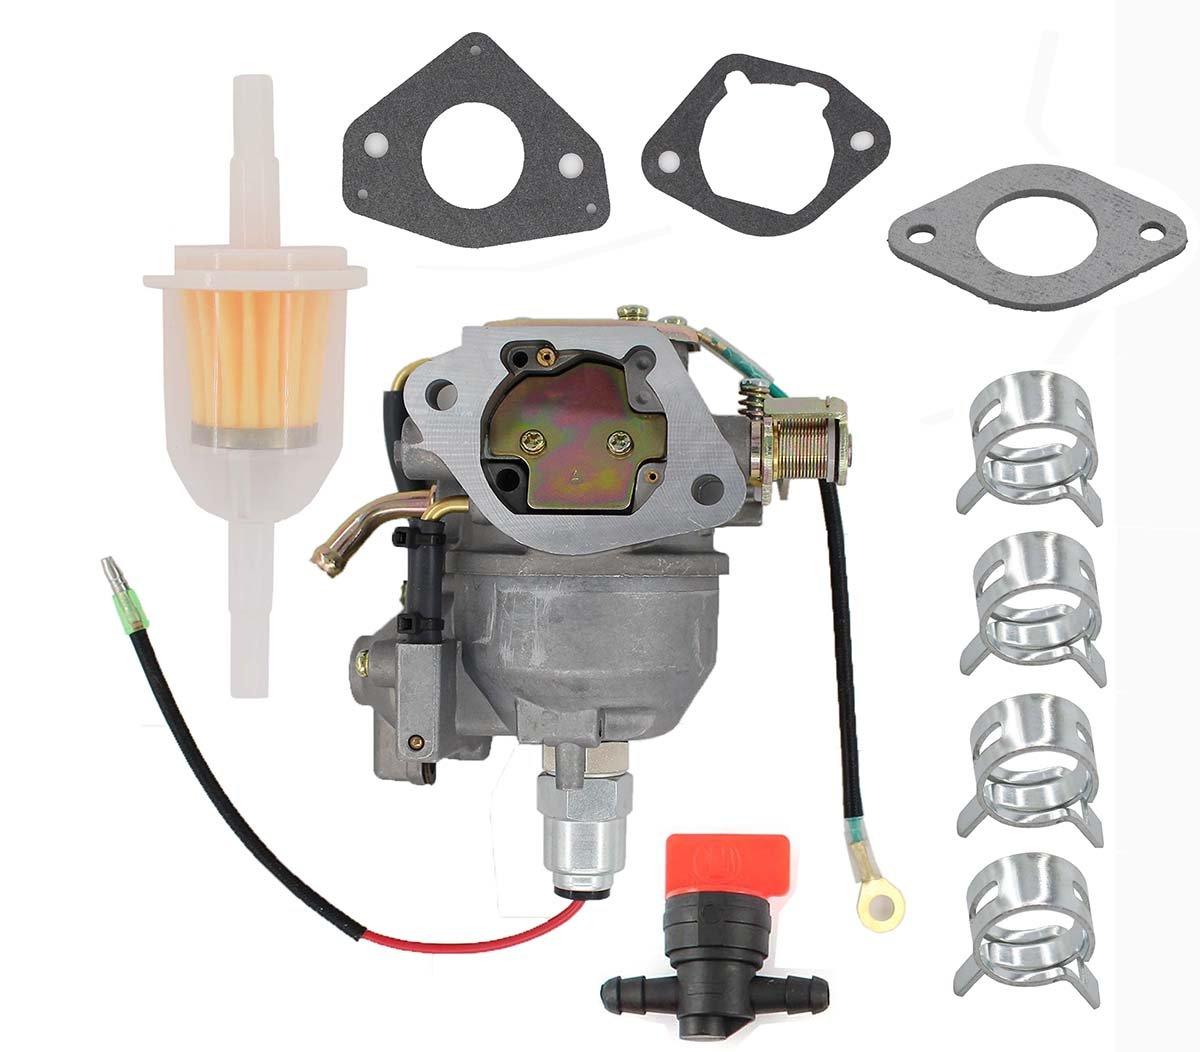 Carburetor For Kohler CV730 S CV740 S 25HP 27 HP Engine 24853102-S 24-853-102-S Car FOR CV730 with specs: 0039, 0040, 0041, 0042, 0043, 0044, 0045, 0046